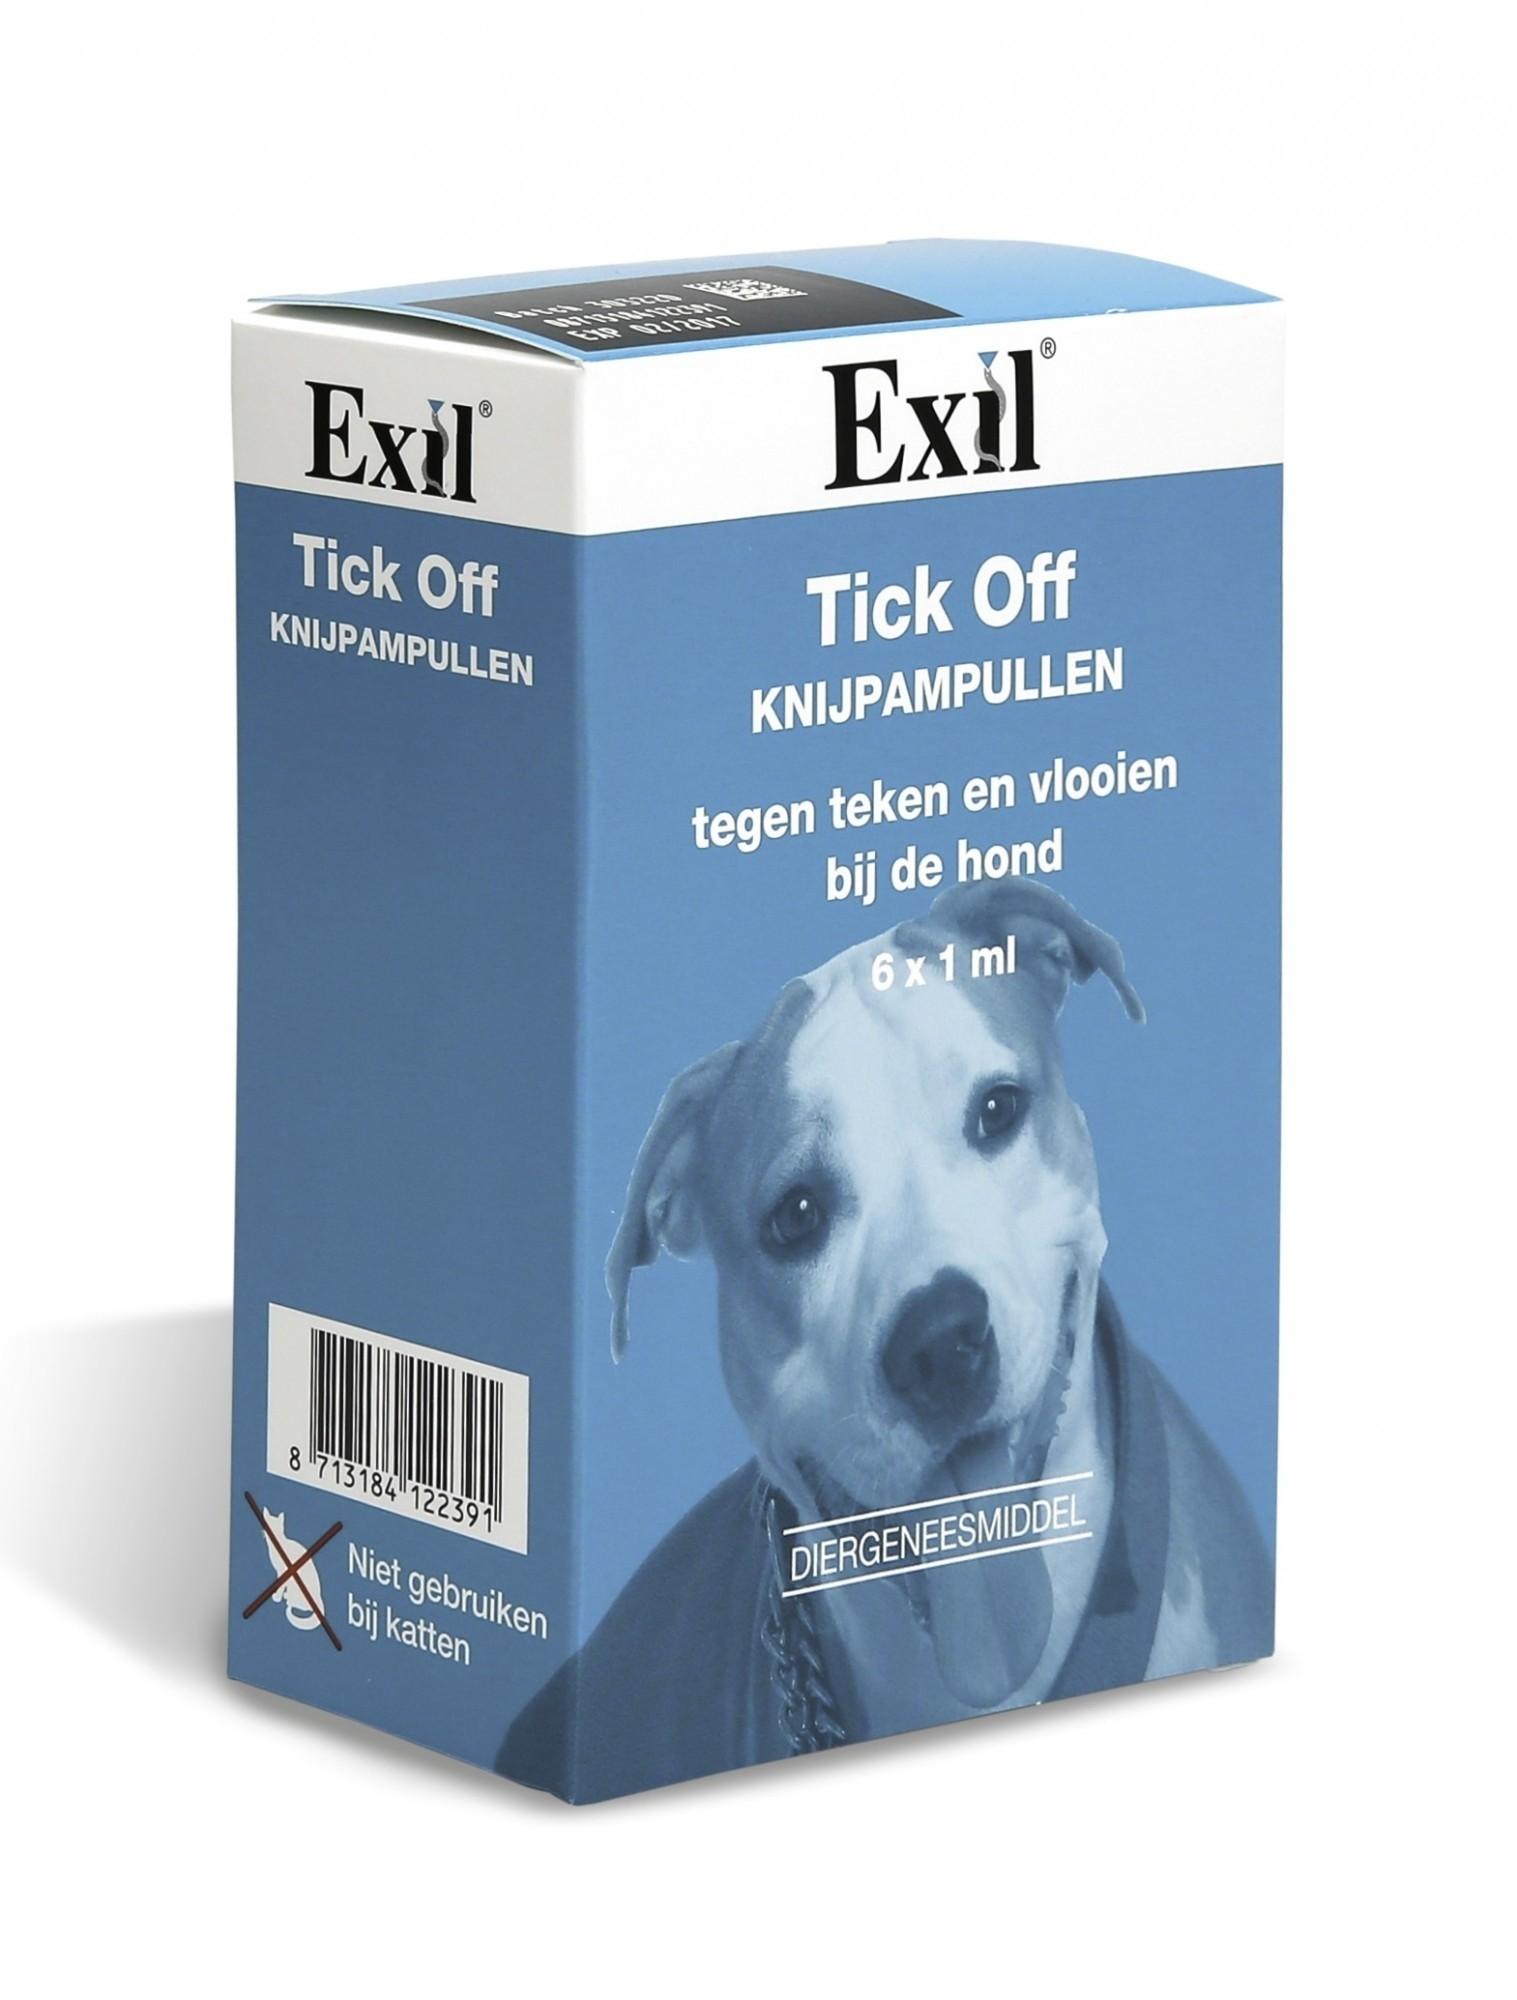 Tick Off tegen vlooien en teken hond 6 pipet